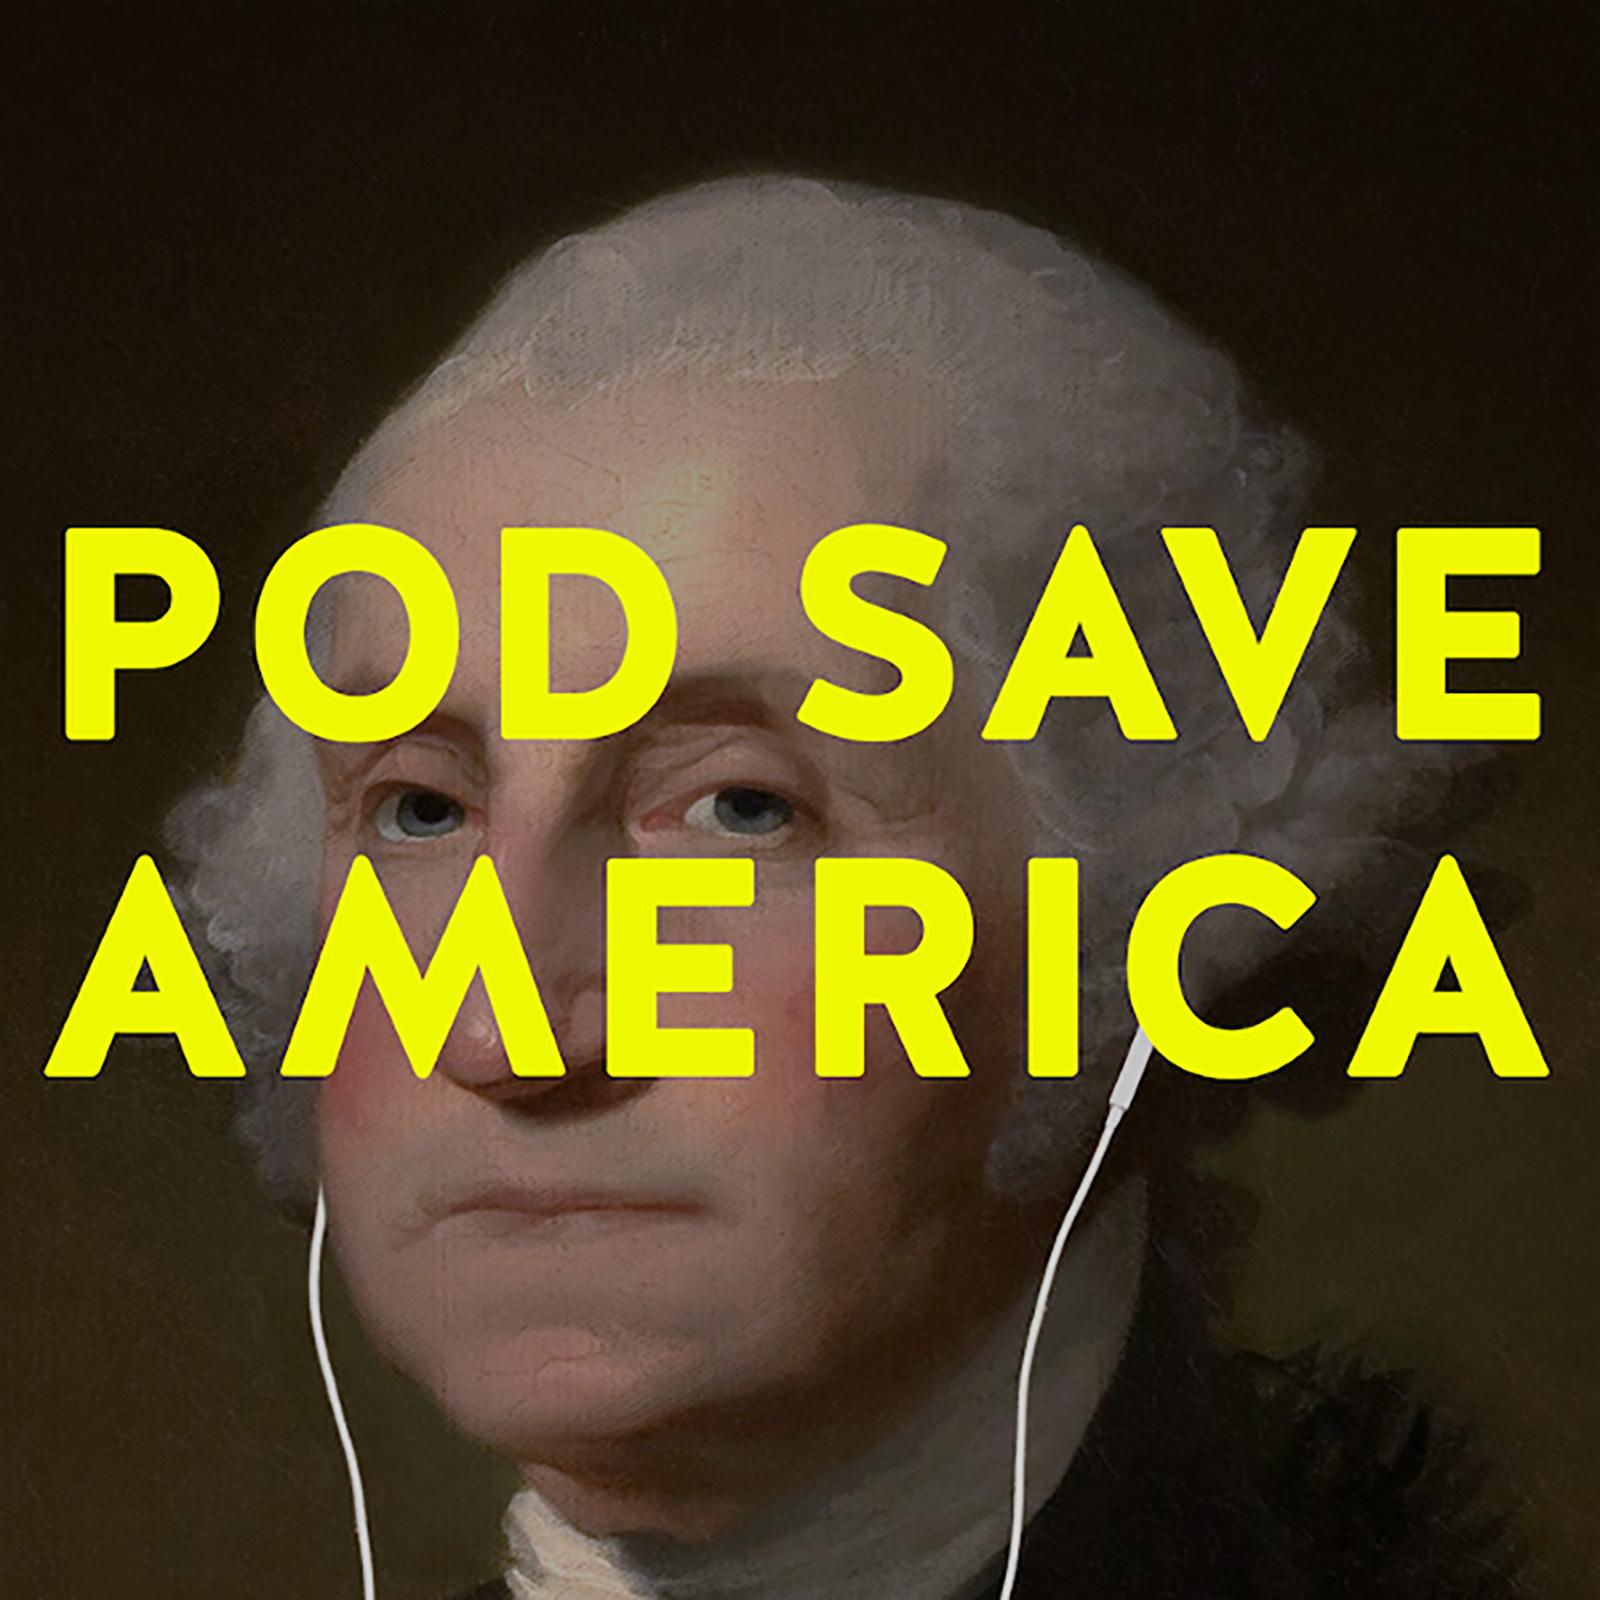 Pod SaveAmerica Cover art by JesseMcLean